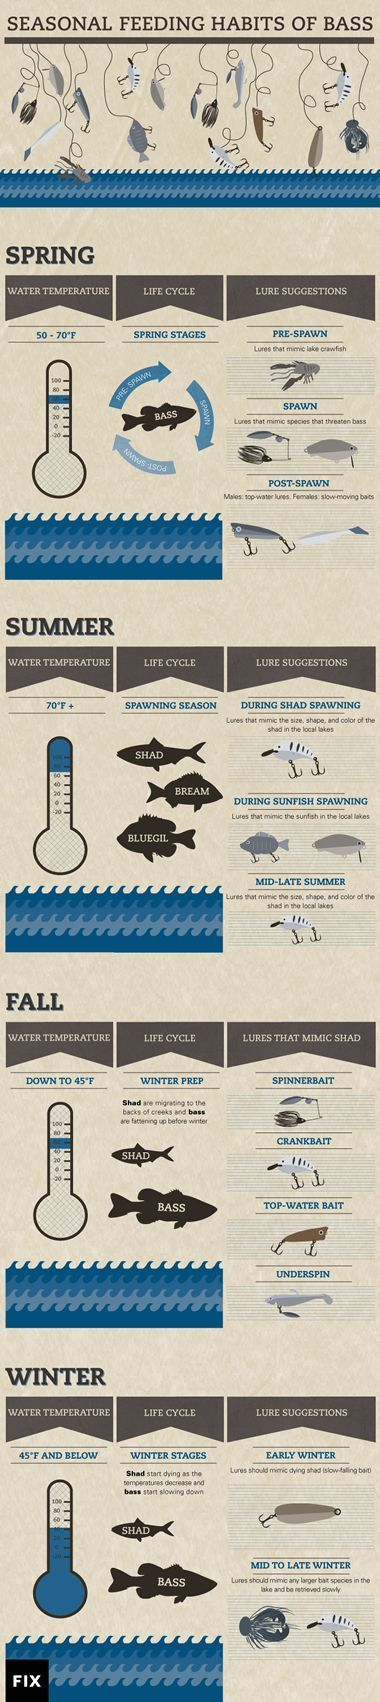 Bass Fishing by Season   Fix.com